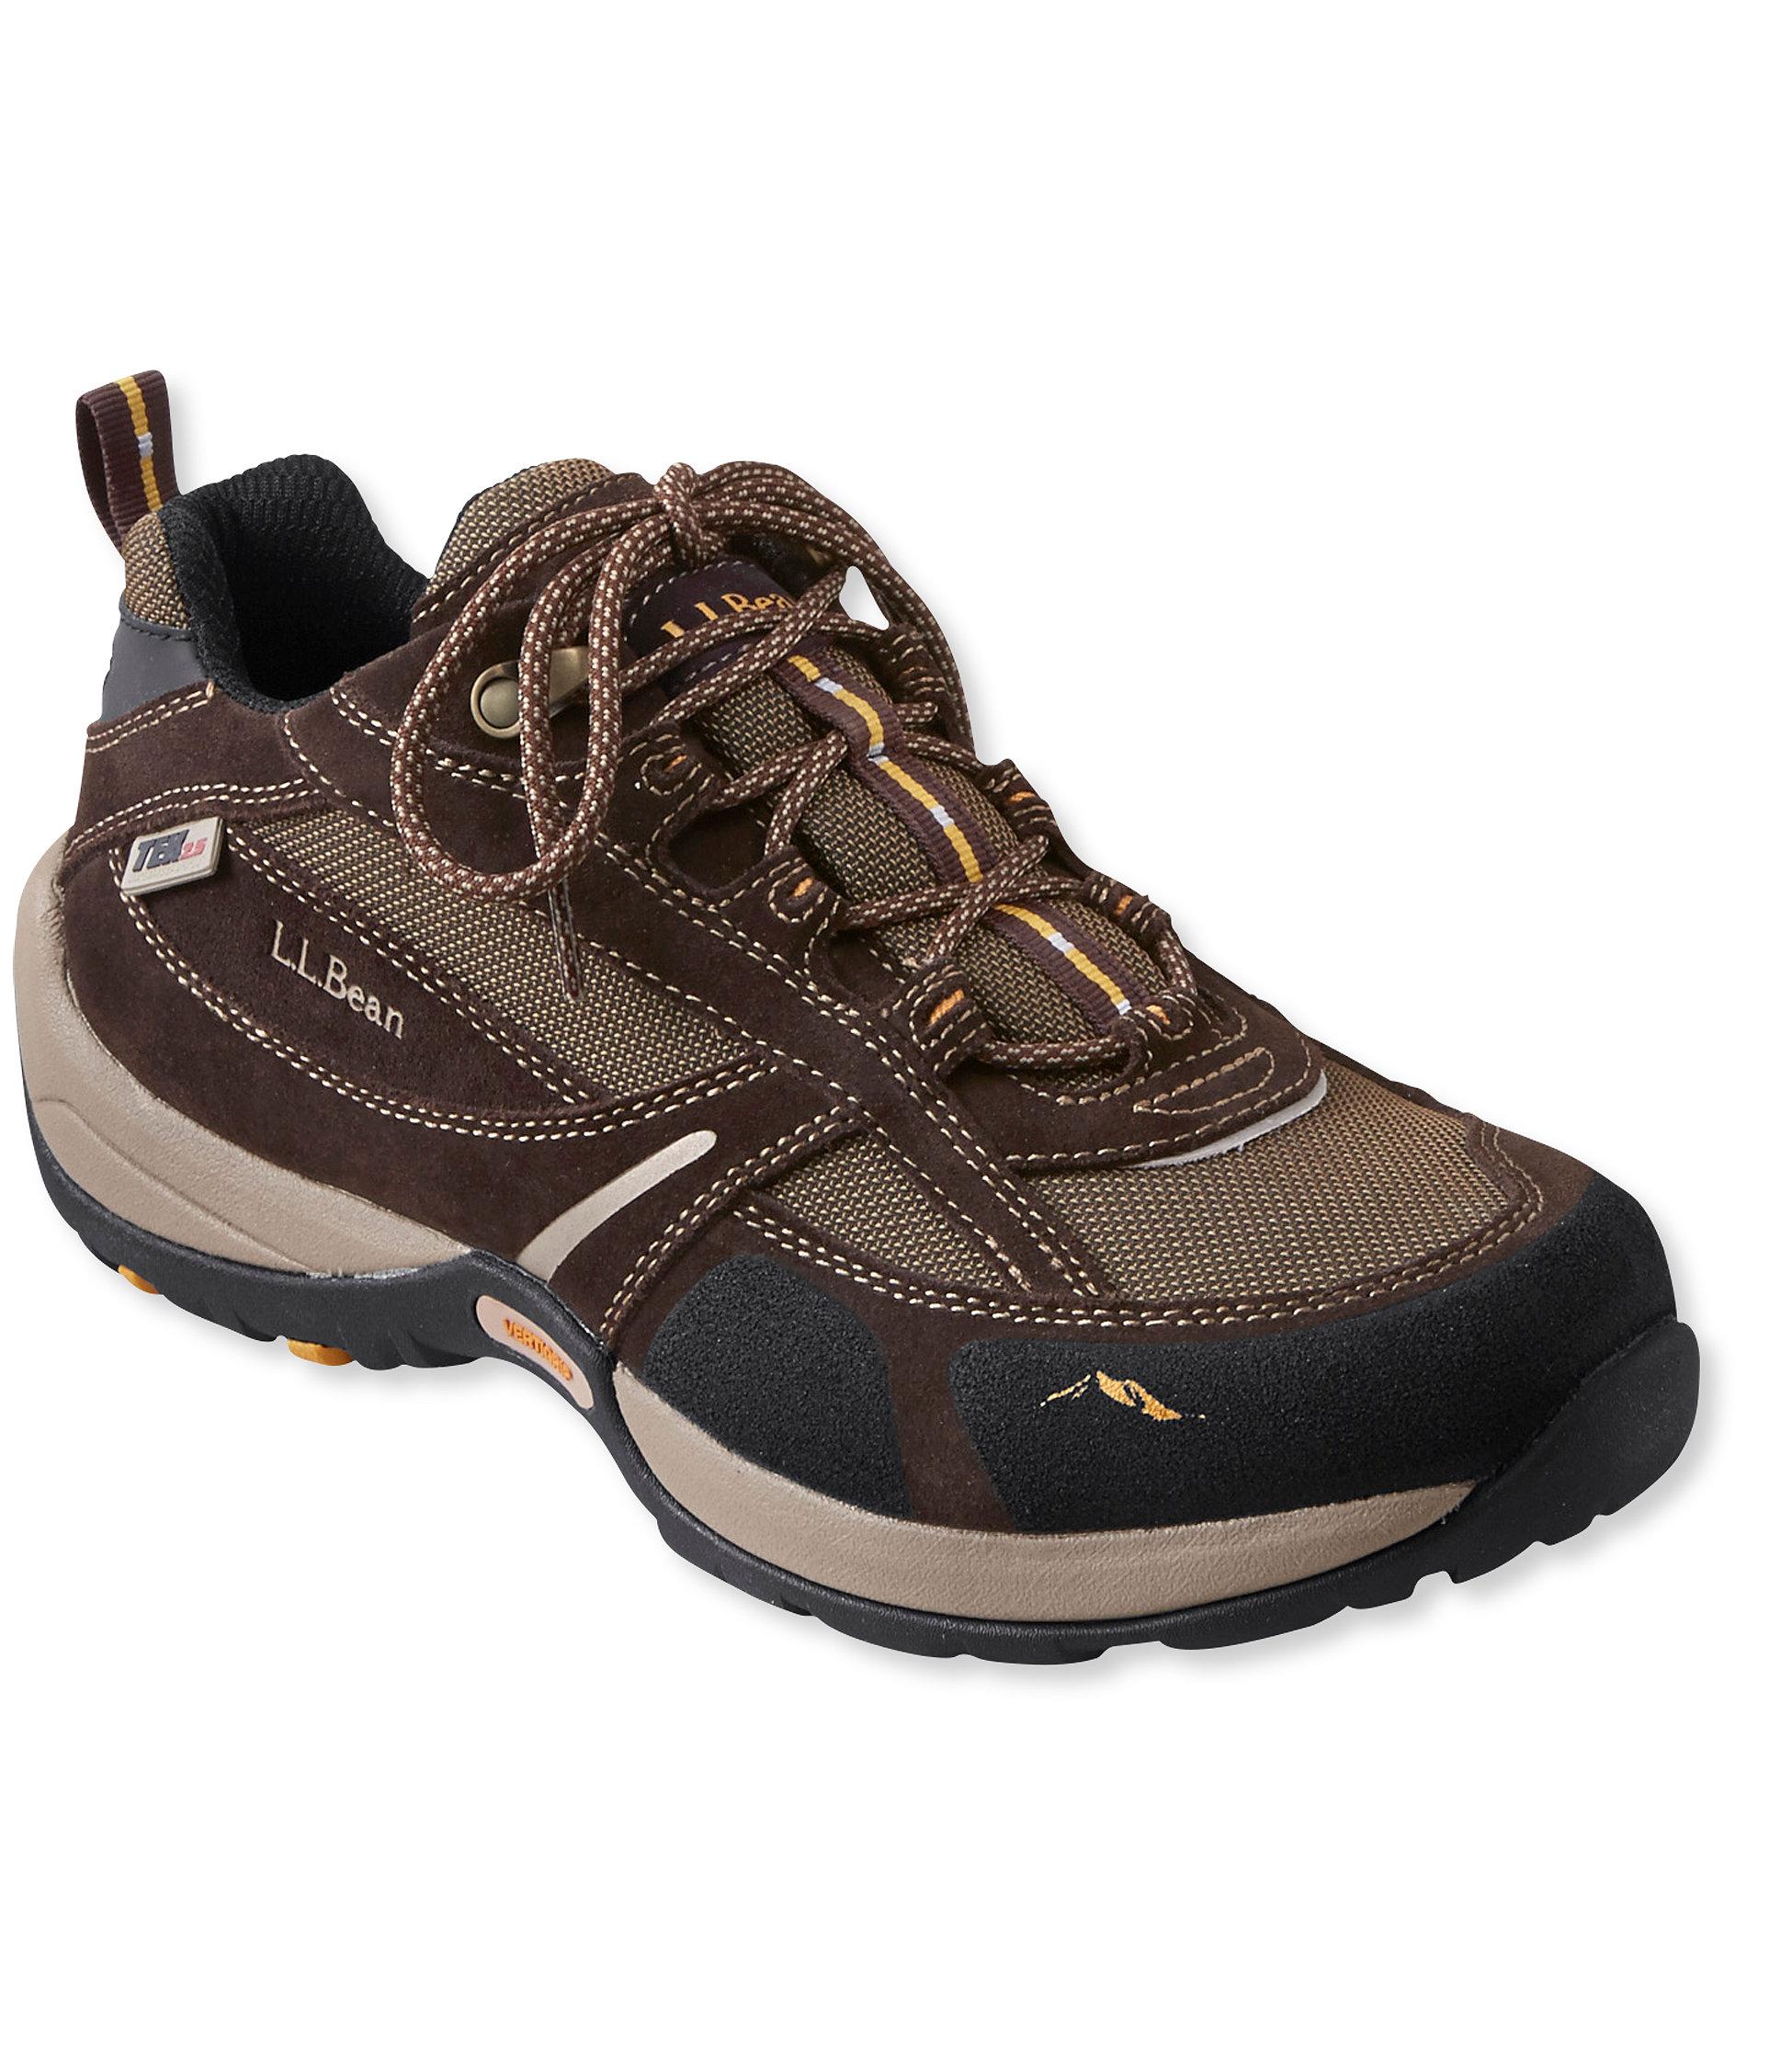 L.L.Bean Bean's Waterproof Trail Model Hikers, Low-Cut